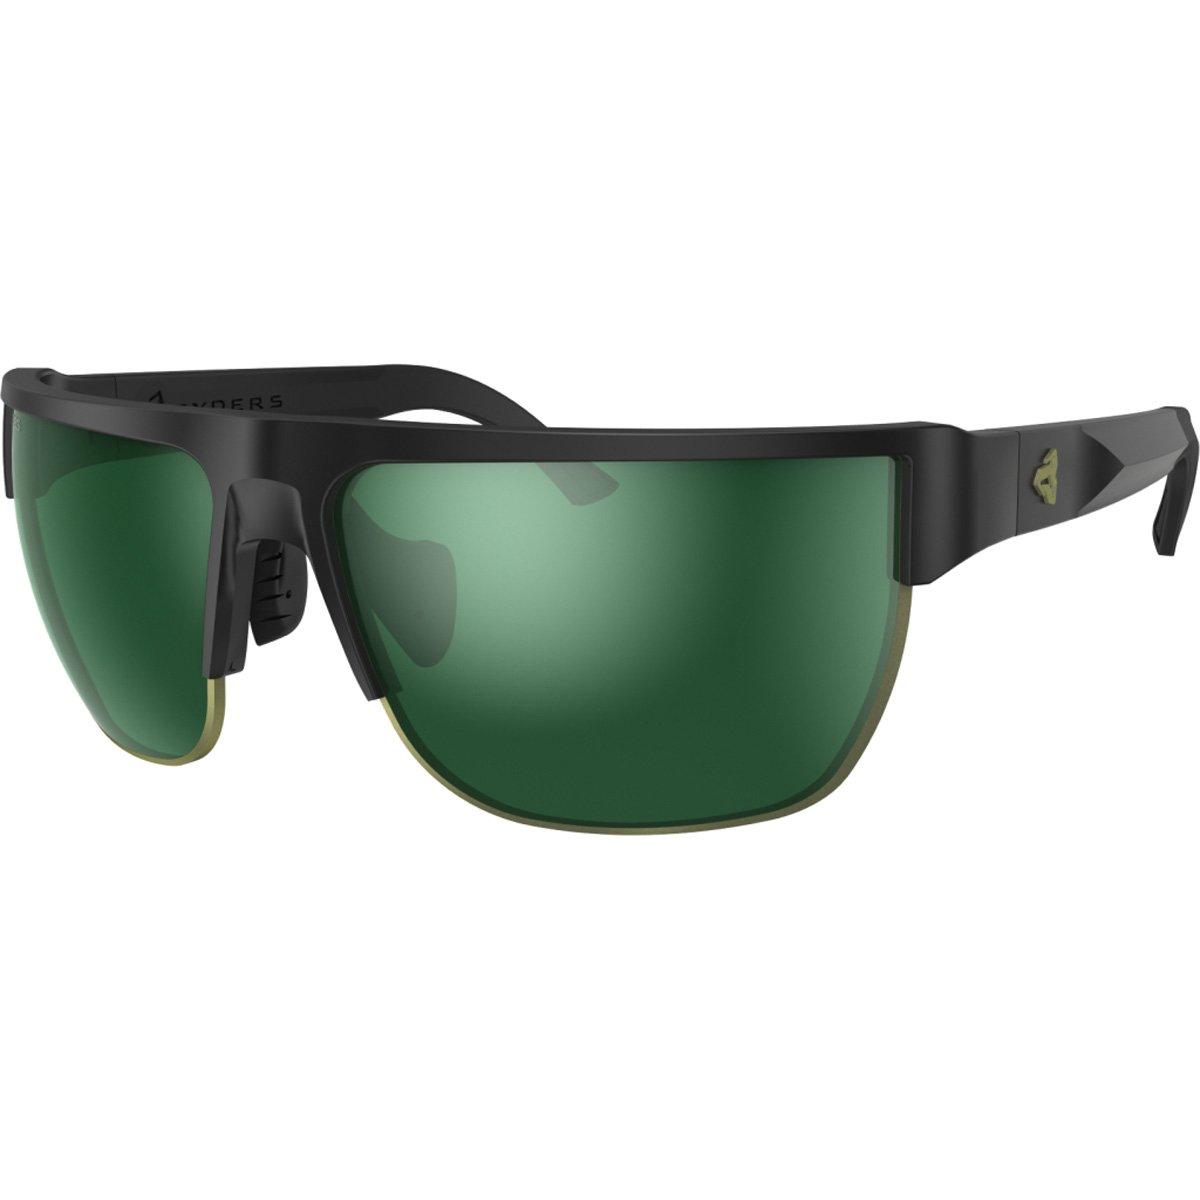 Ryders Eyewear Boundary Standard Lens Sunglasses